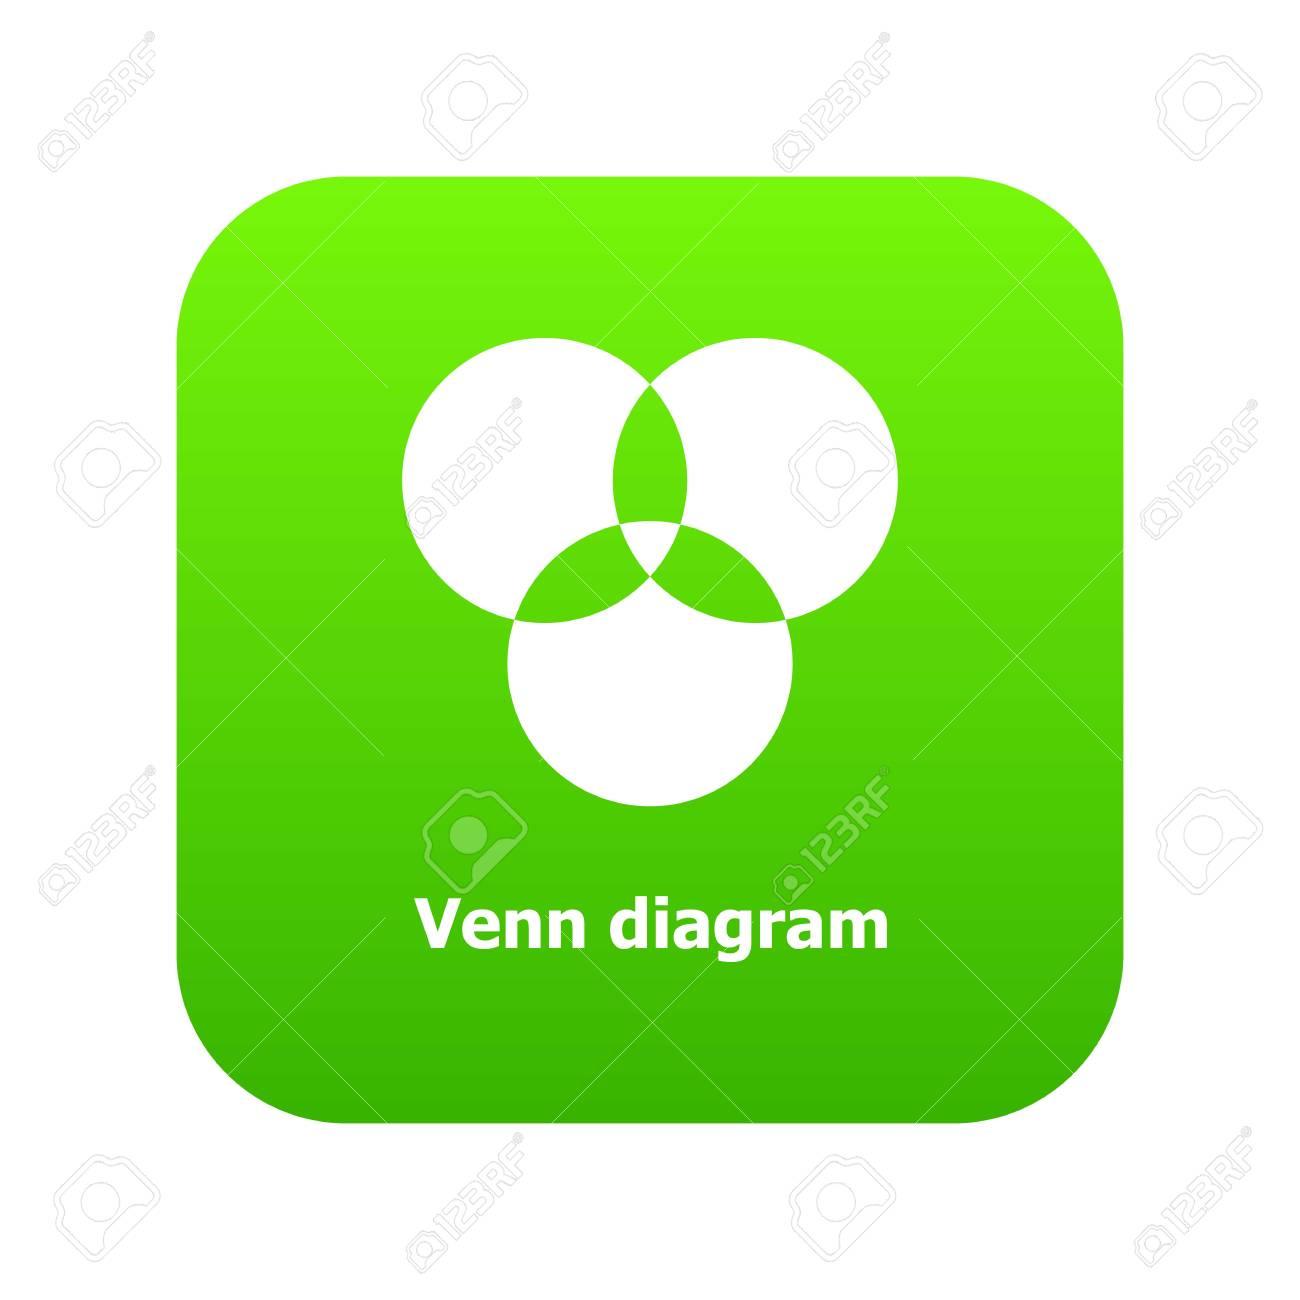 Round venn diagram icon green vector isolated on white background round venn diagram icon green vector isolated on white background stock vector 99983143 ccuart Choice Image